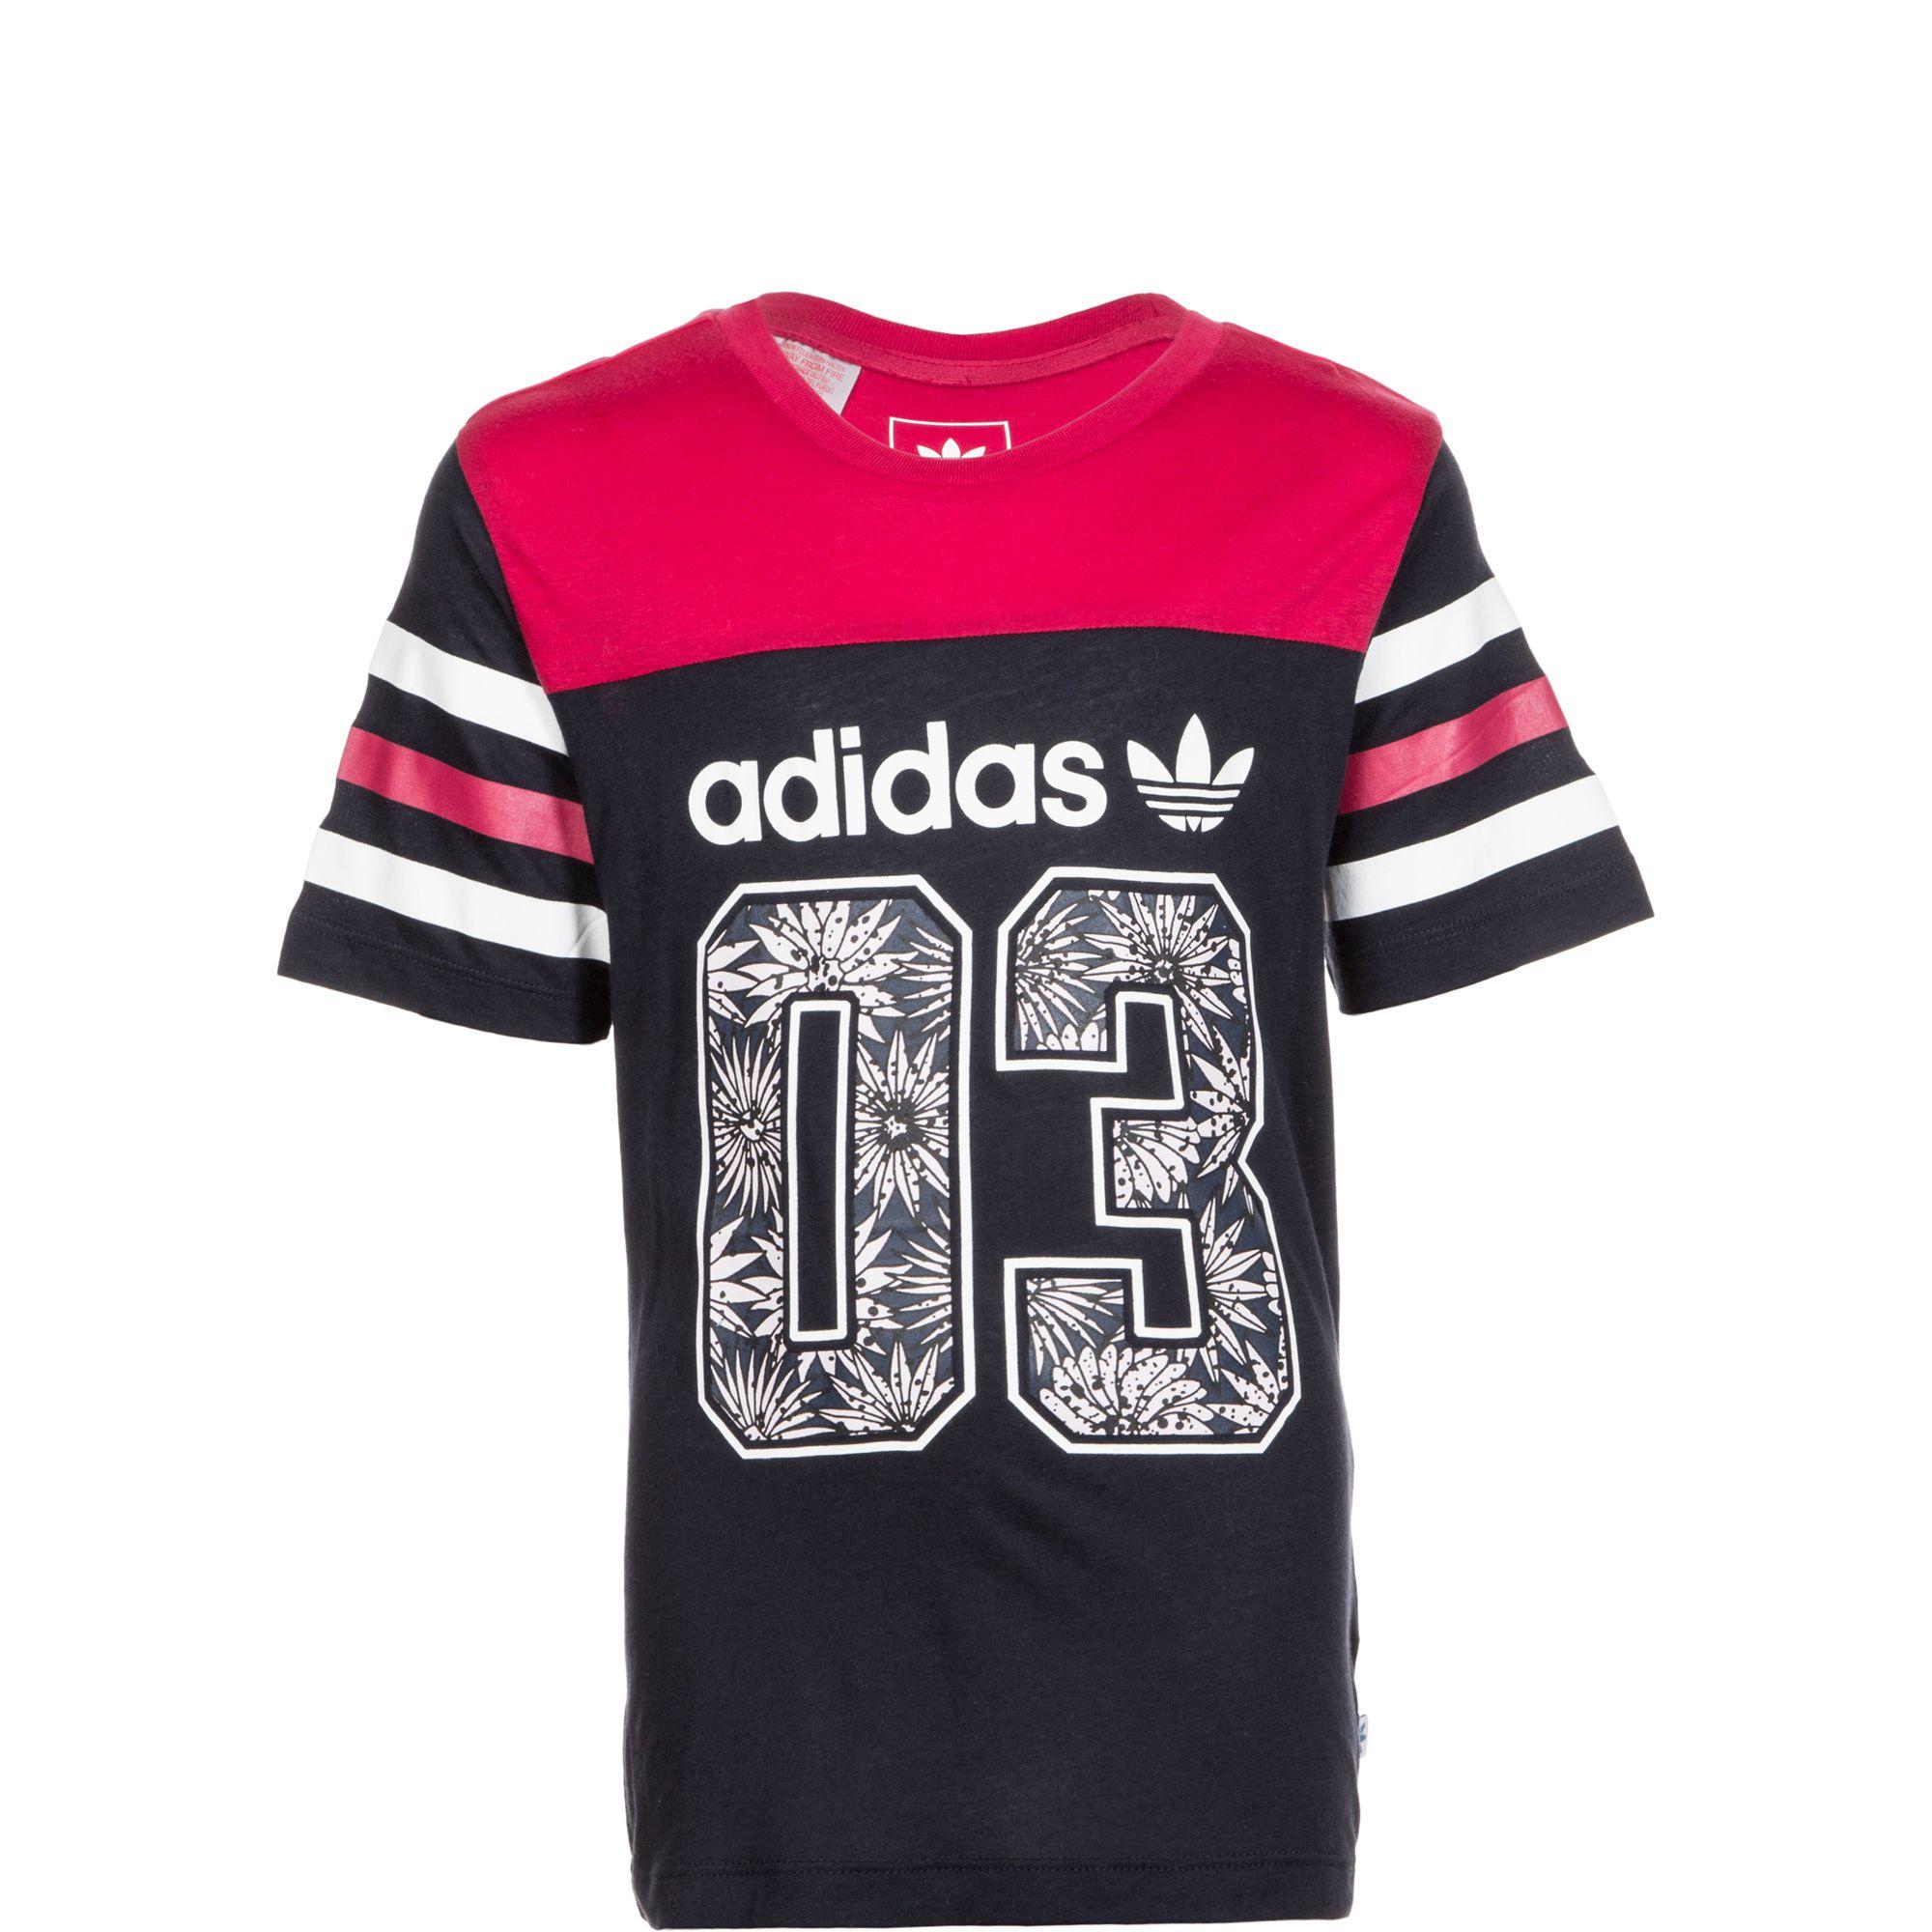 ADIDAS ORIGINALS adidas Originals FR T-Shirt Kinder